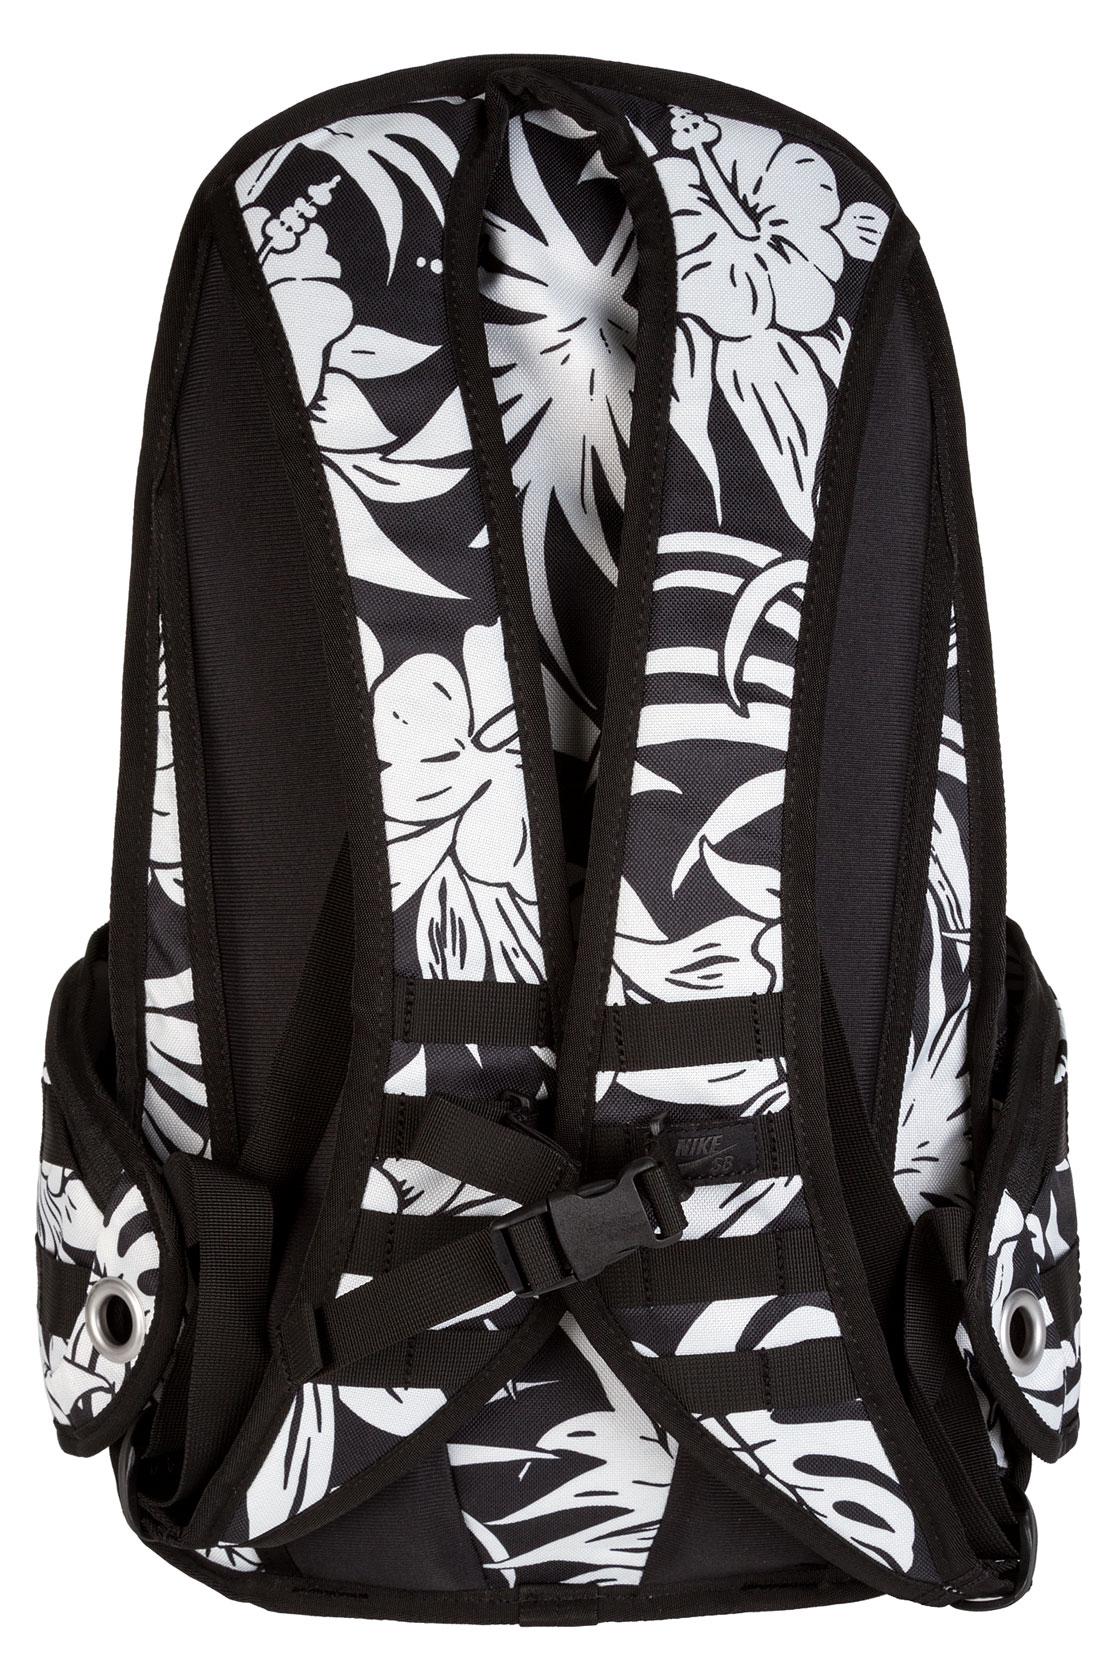 9450e15492436c Nike SB RPM Graphic Backpack (black black black) buy at skatedeluxe